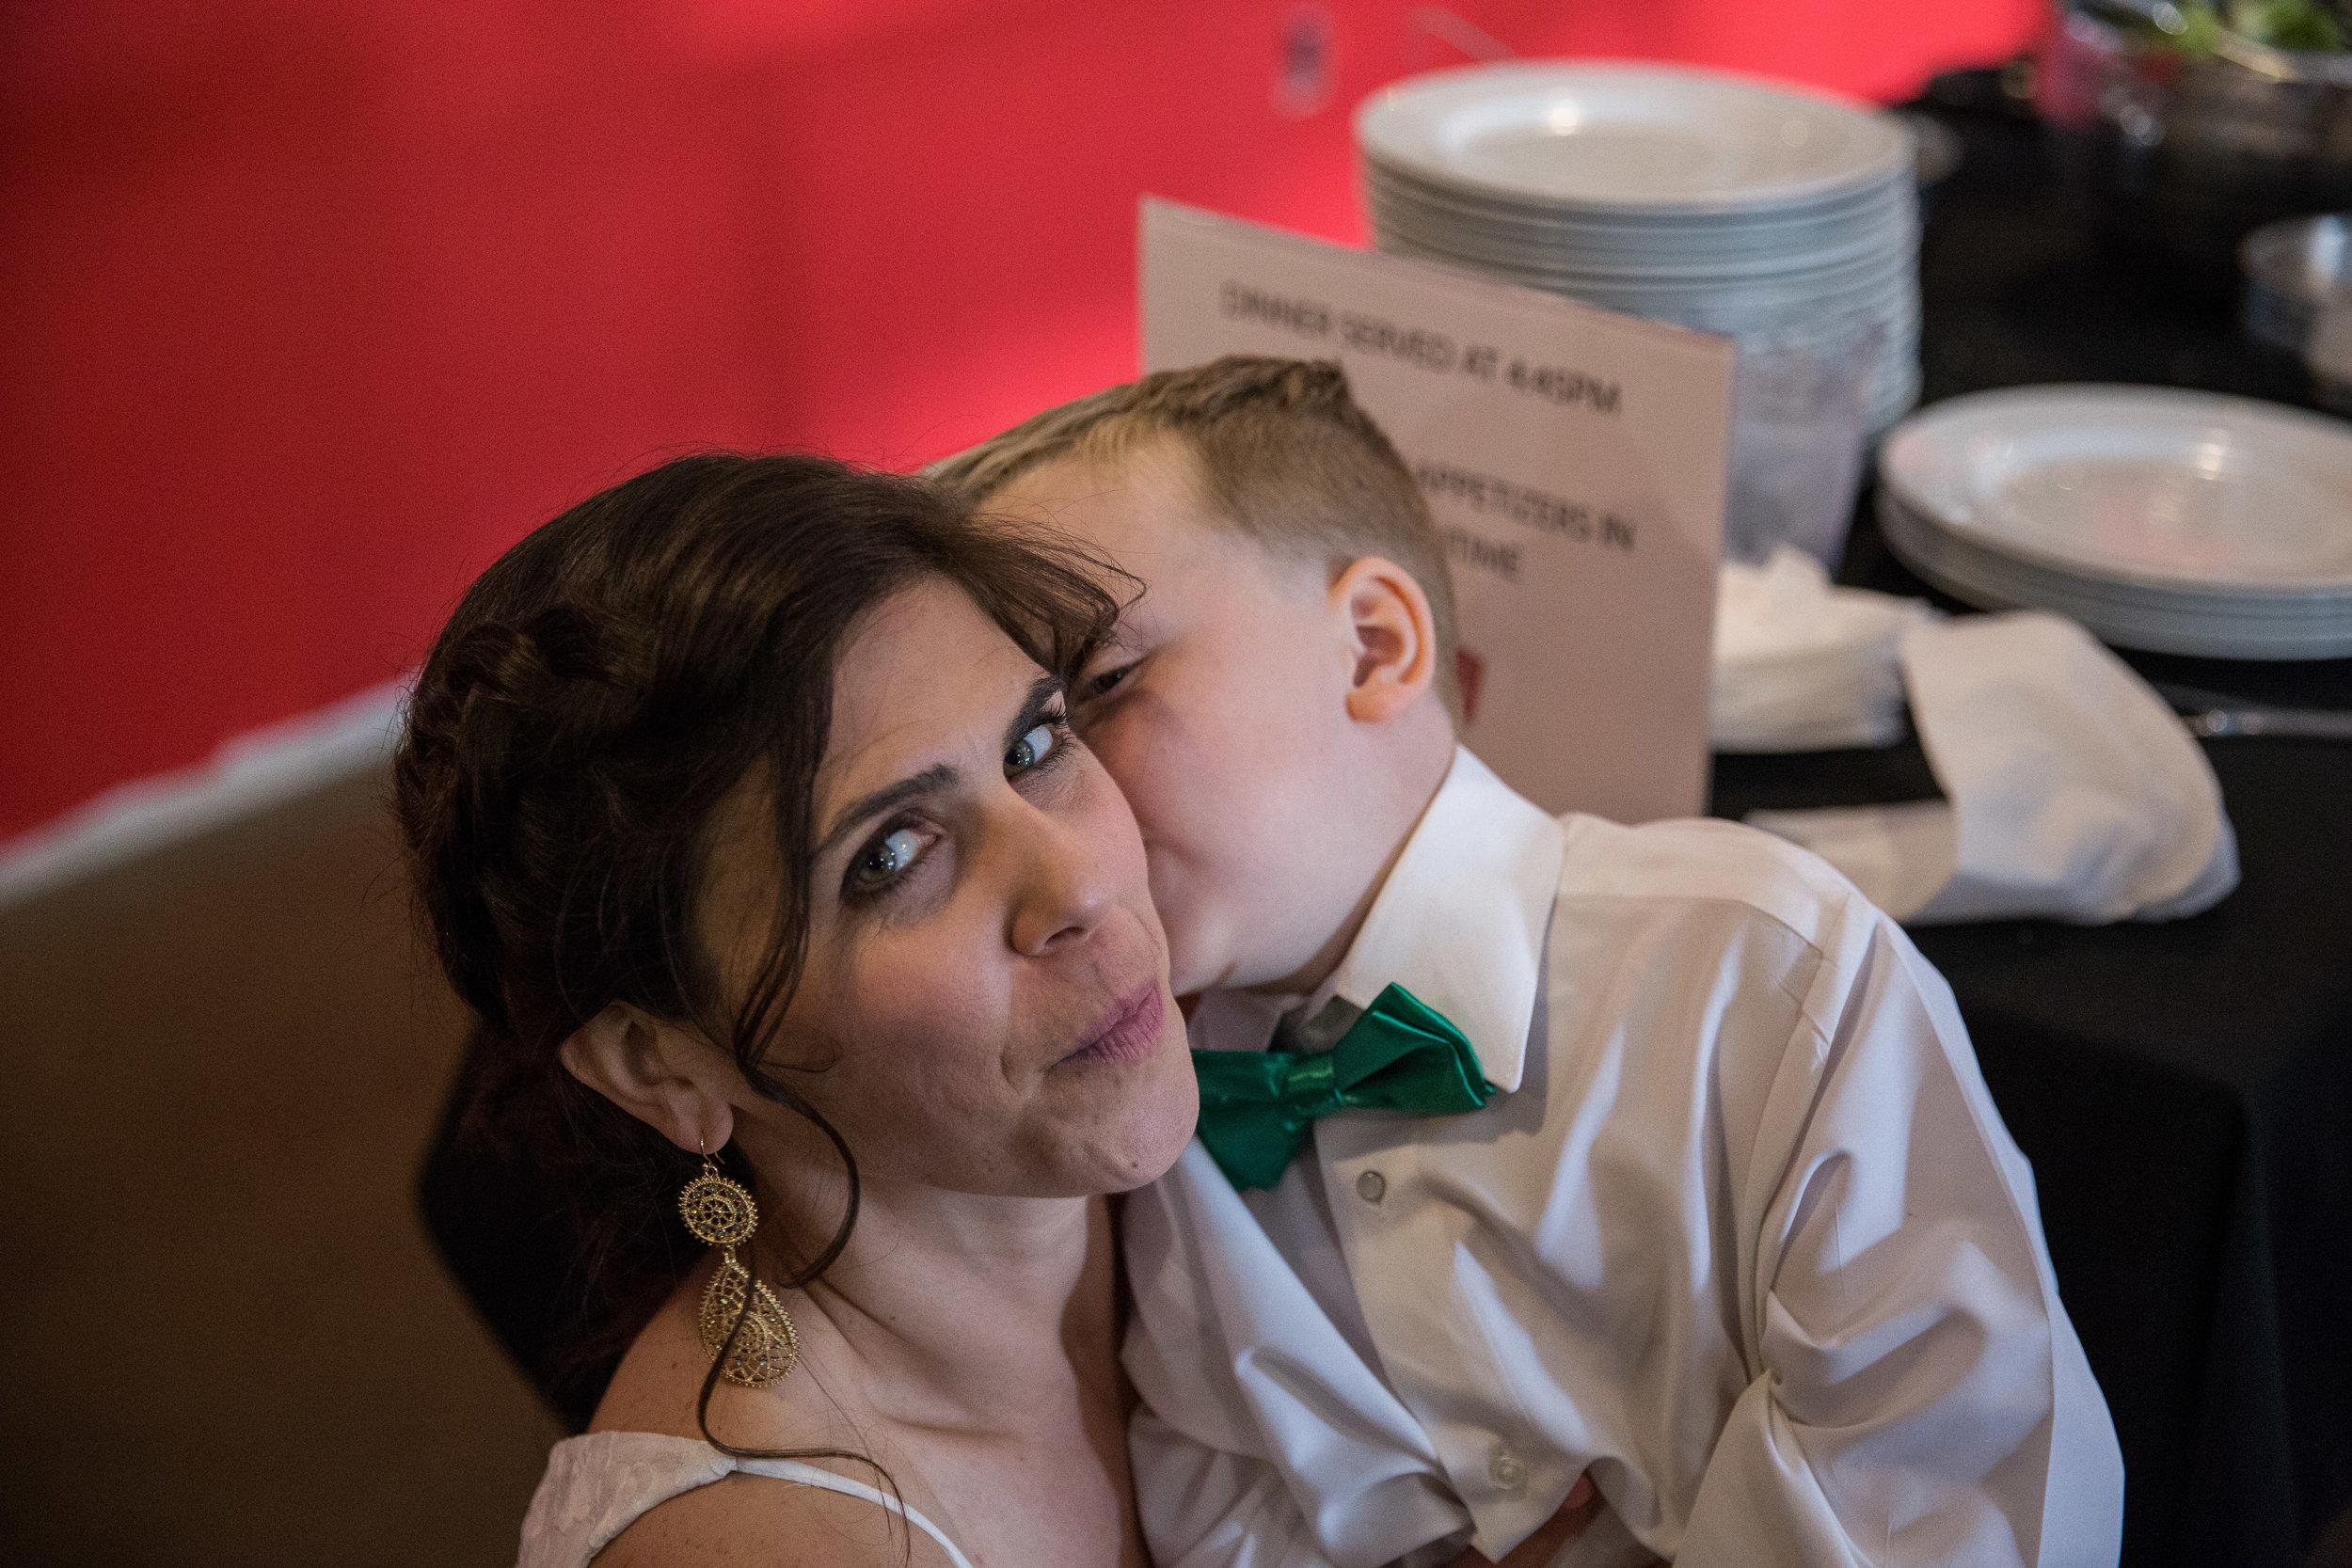 Natalie and Dallas Mooney Wedding 6-8-19_Tania Watt Photography-561.jpg